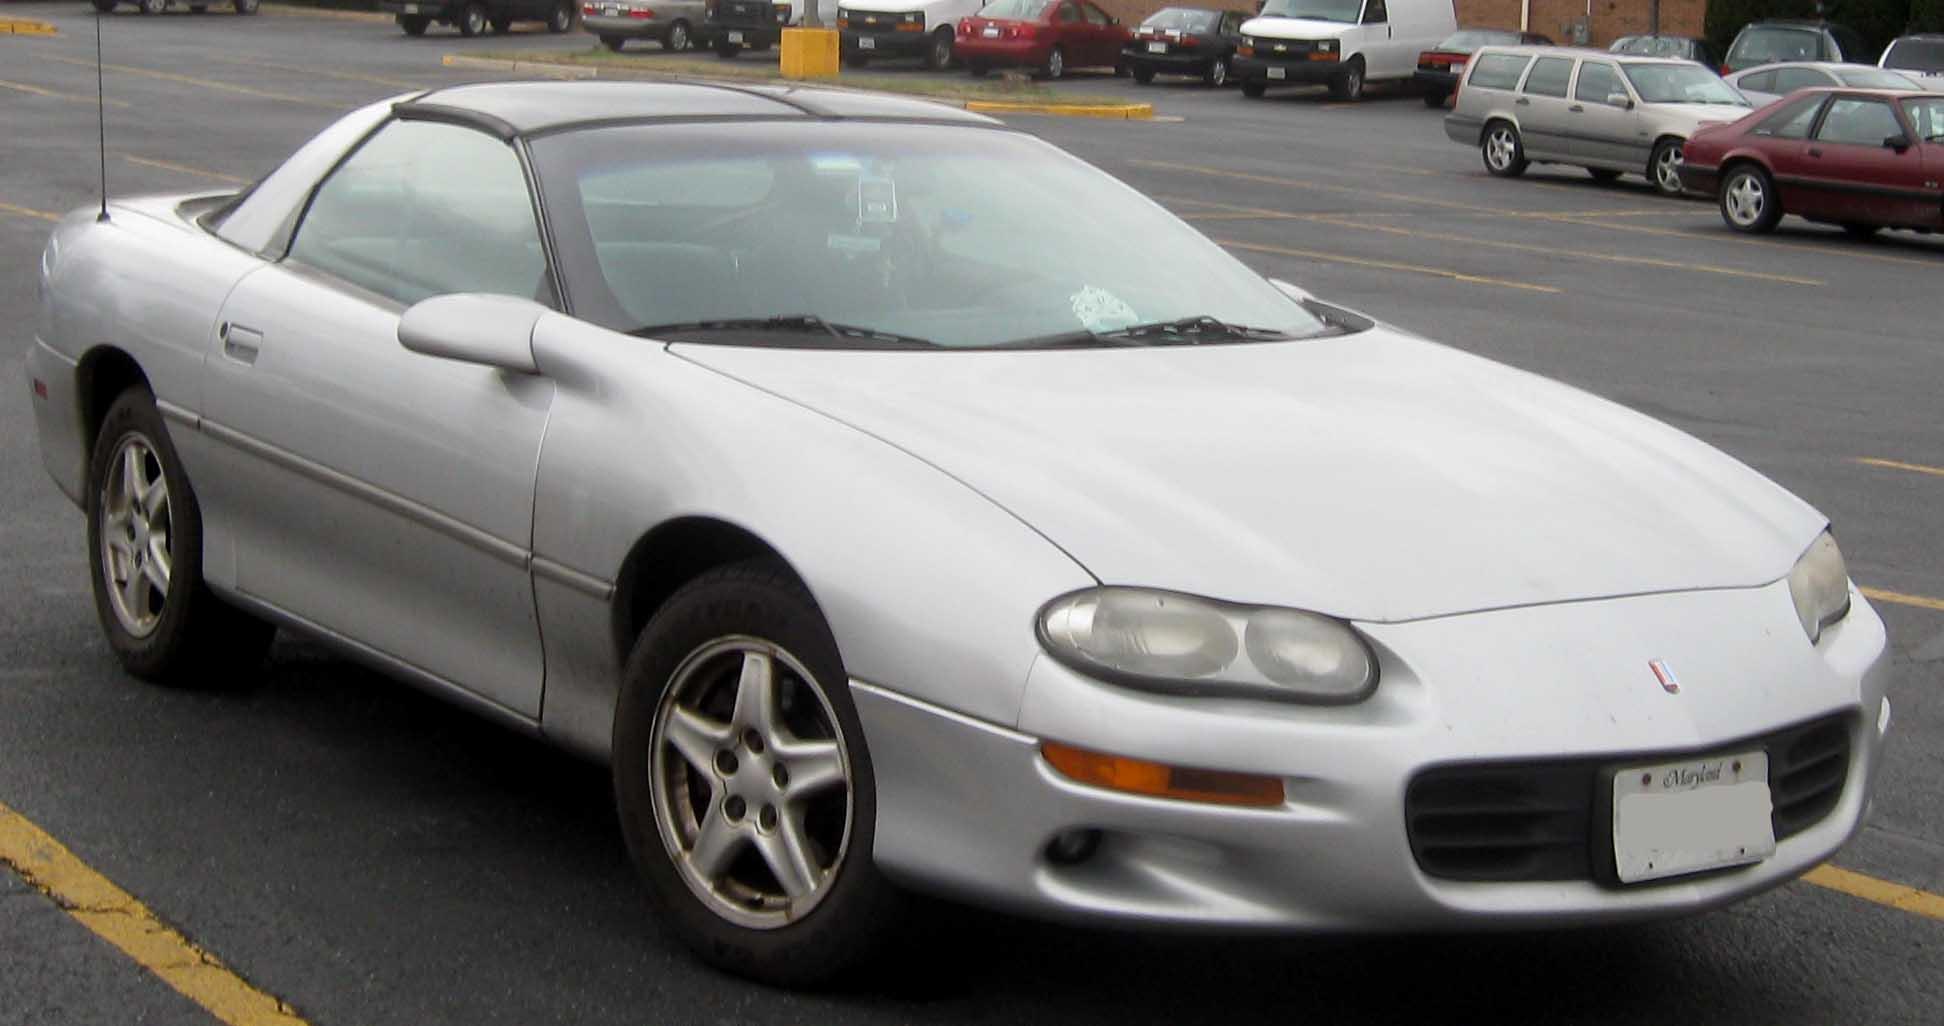 1998 Chevrolet Camaro Information And Photos Zombiedrive